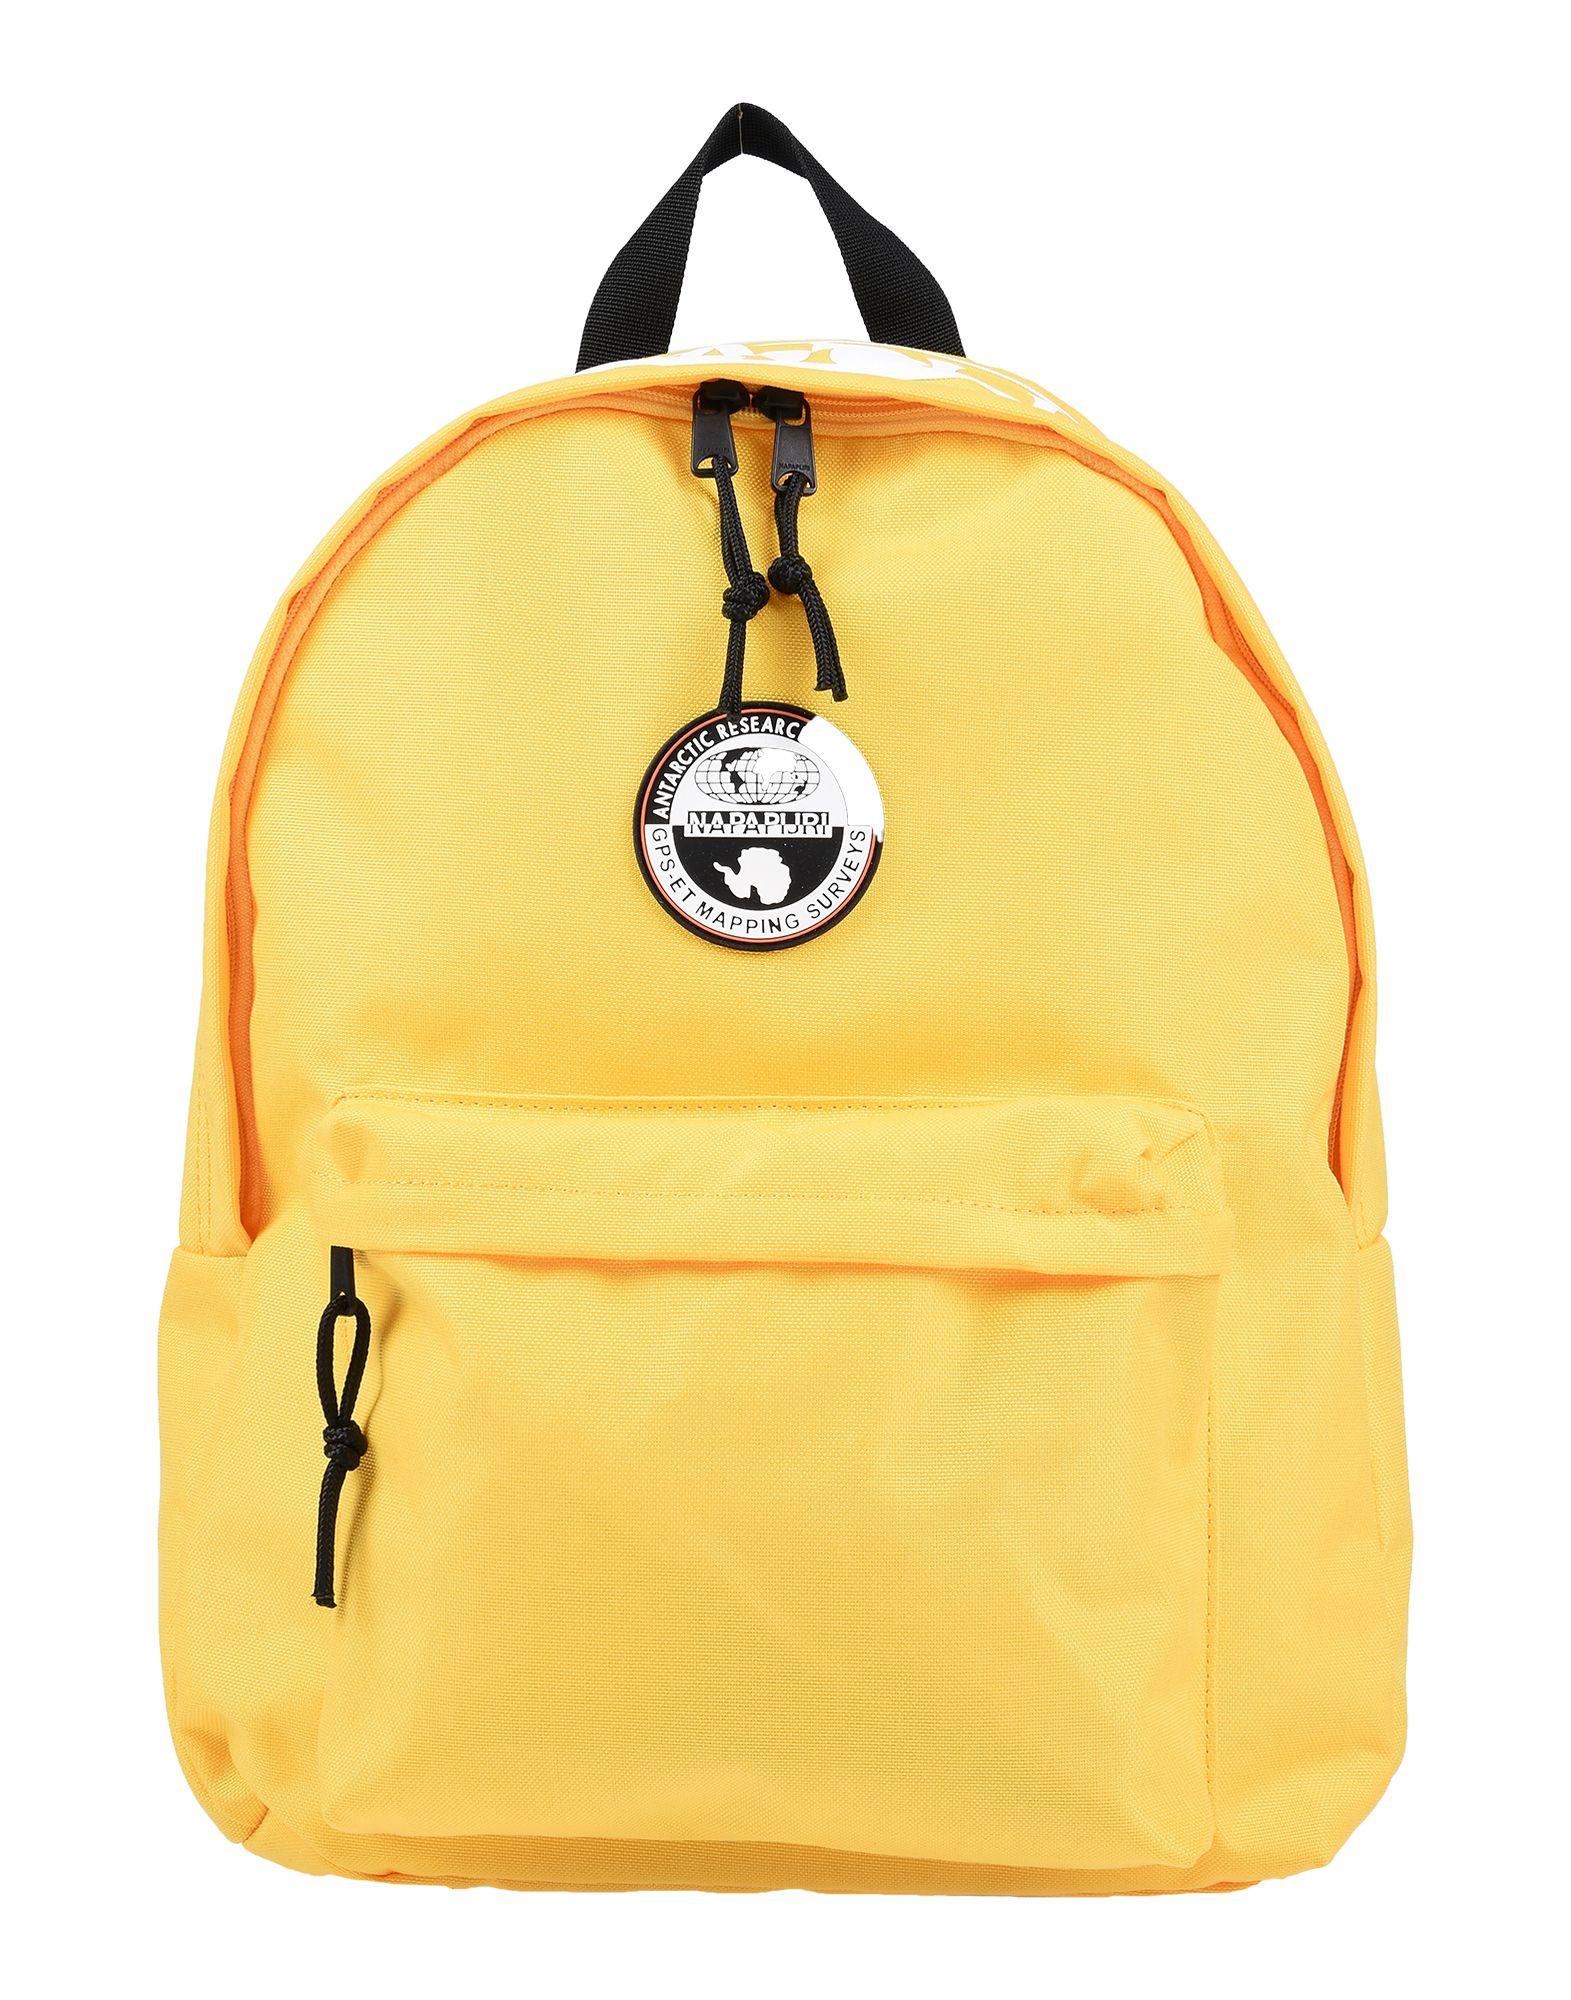 Napapijri Backpack   Fanny Pack Girl 3-8 years online on YOOX United States